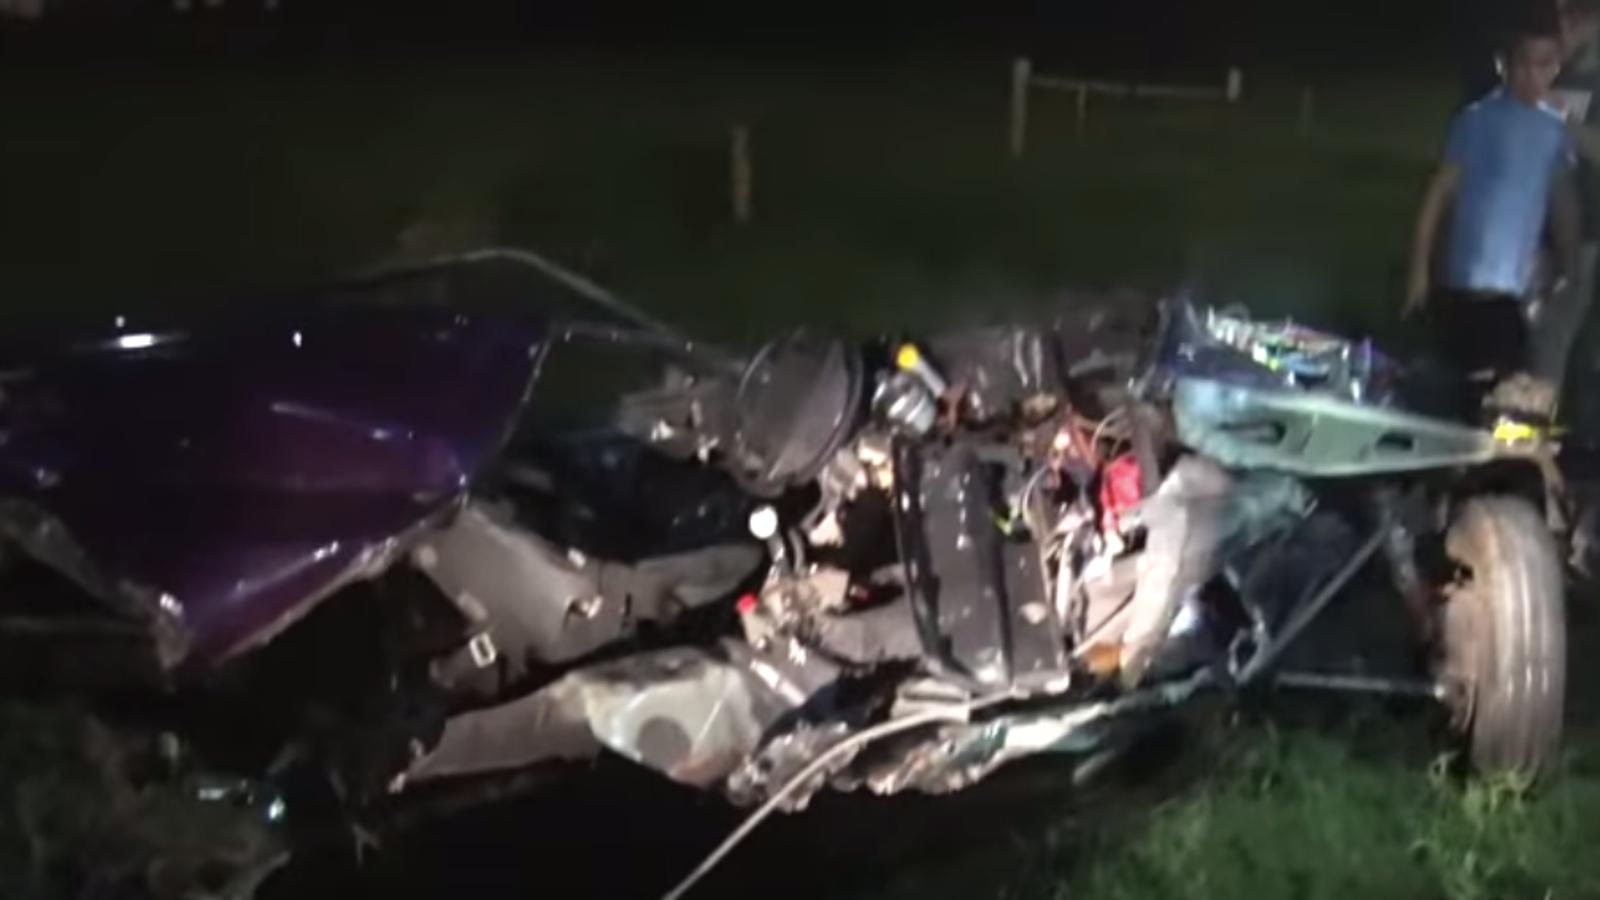 Mustang Split In Half During Idiotic Street Racing Crash